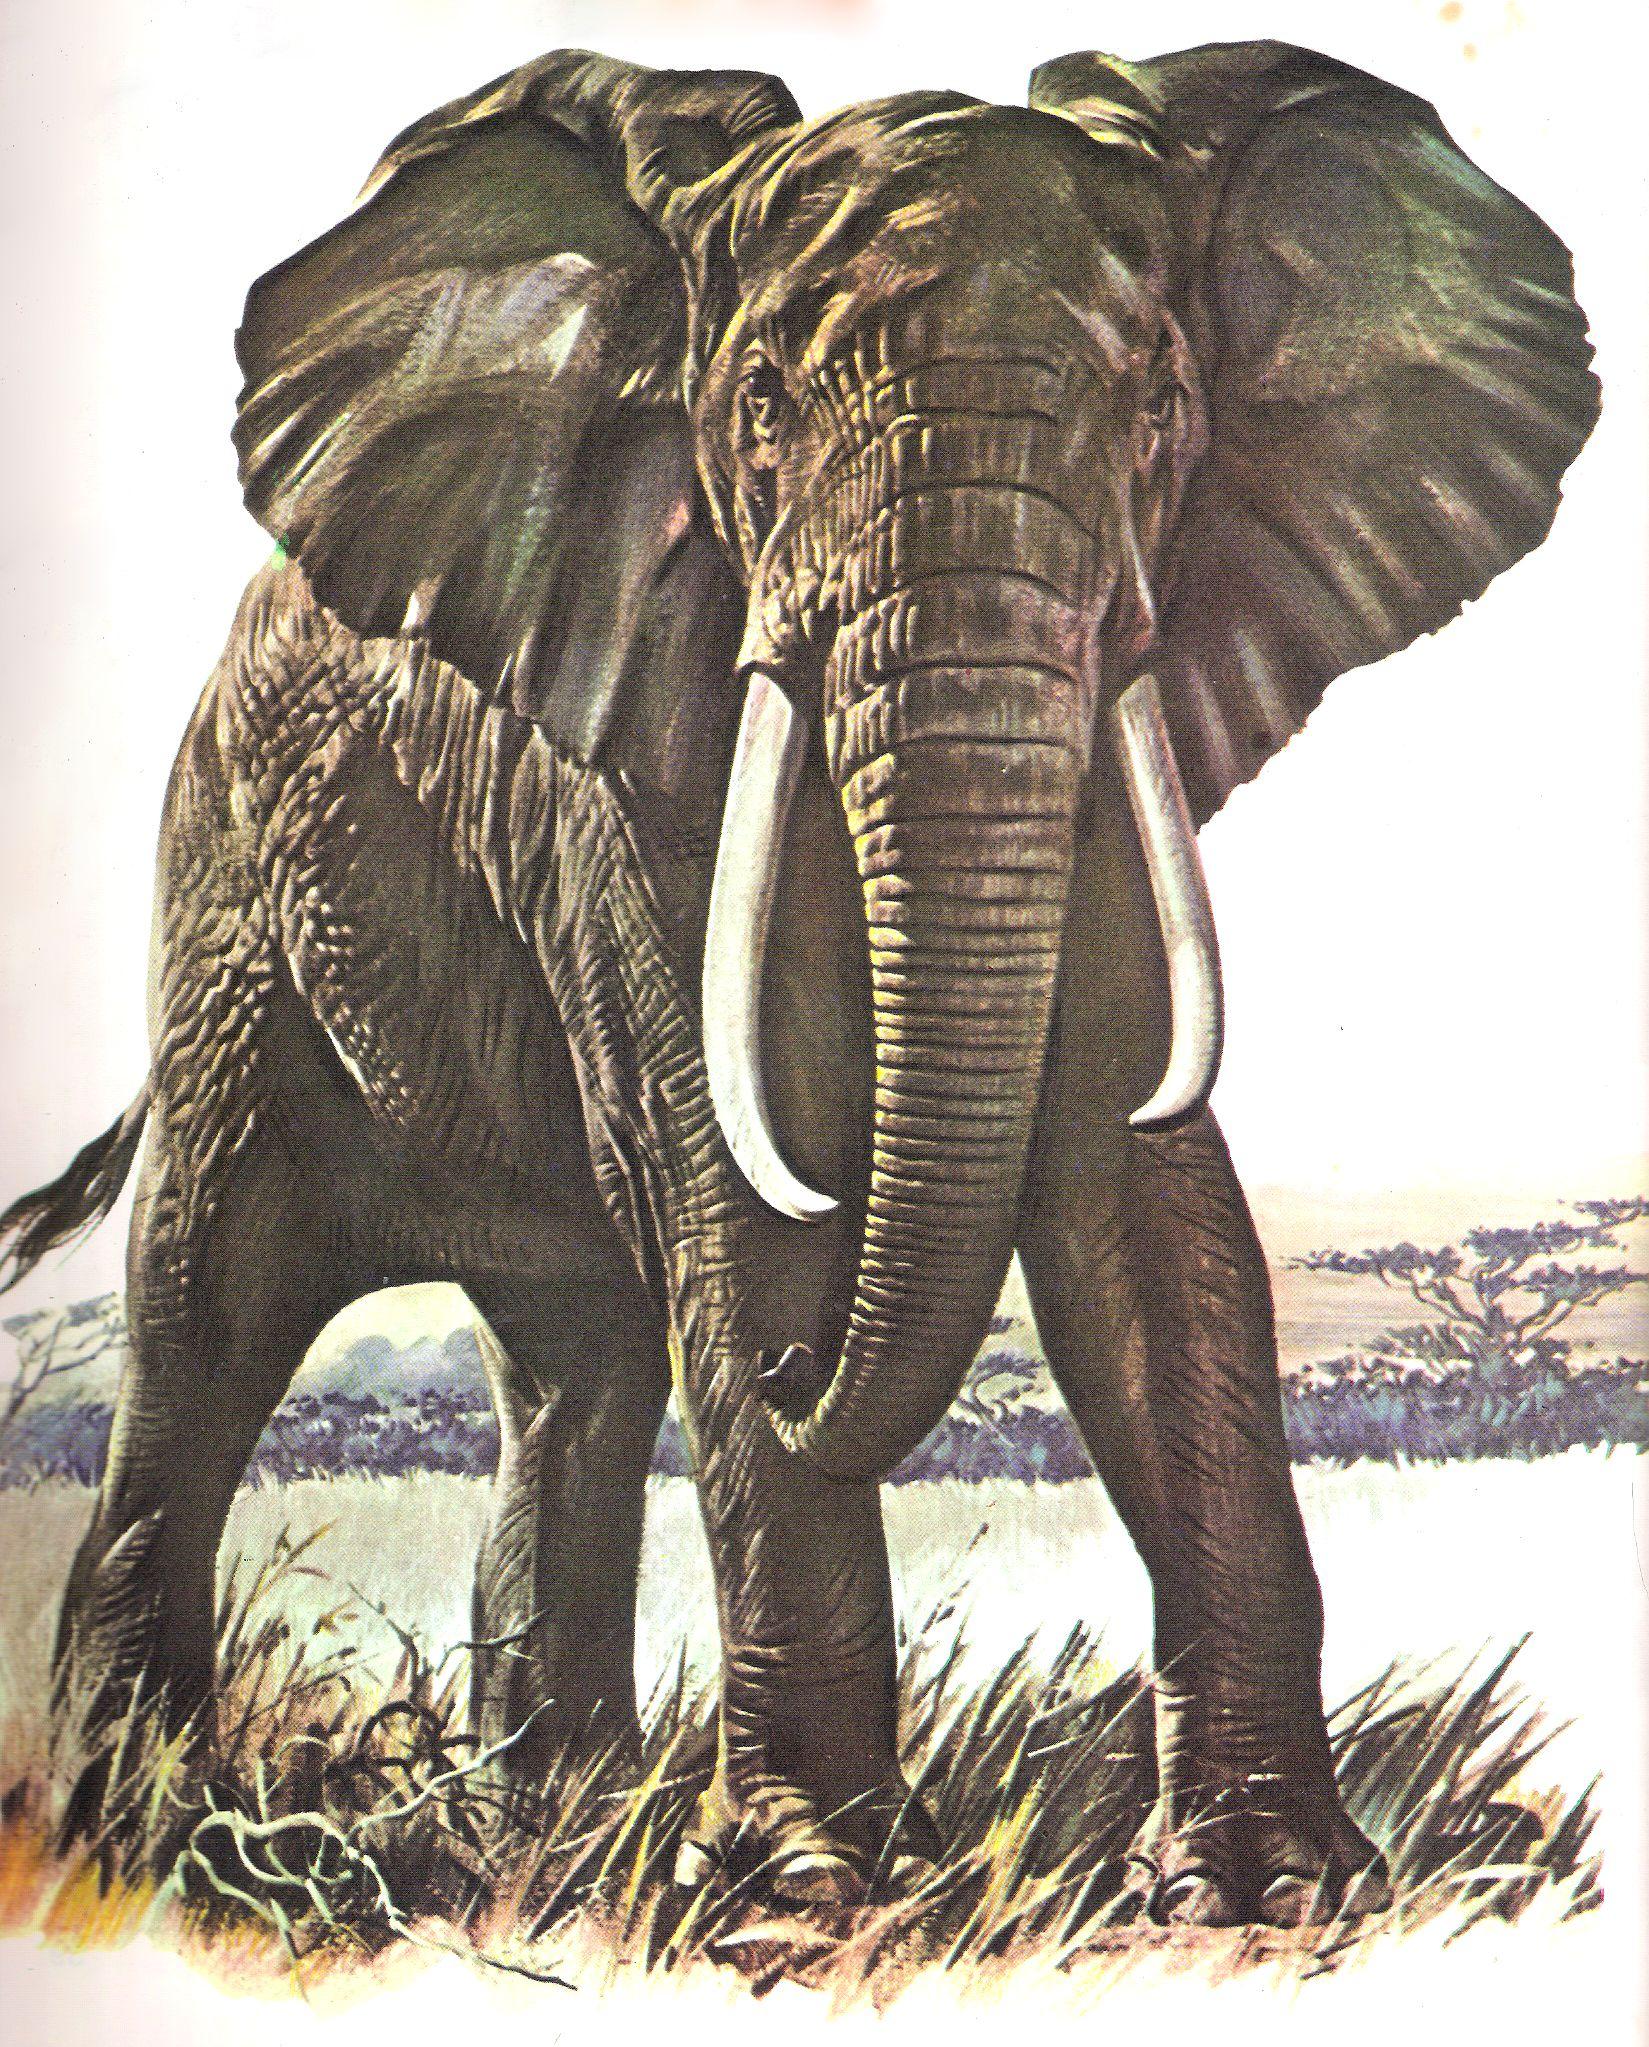 Enciclopédia Os Bichos - Editora Abril Cultural (1970) - Elefante ...